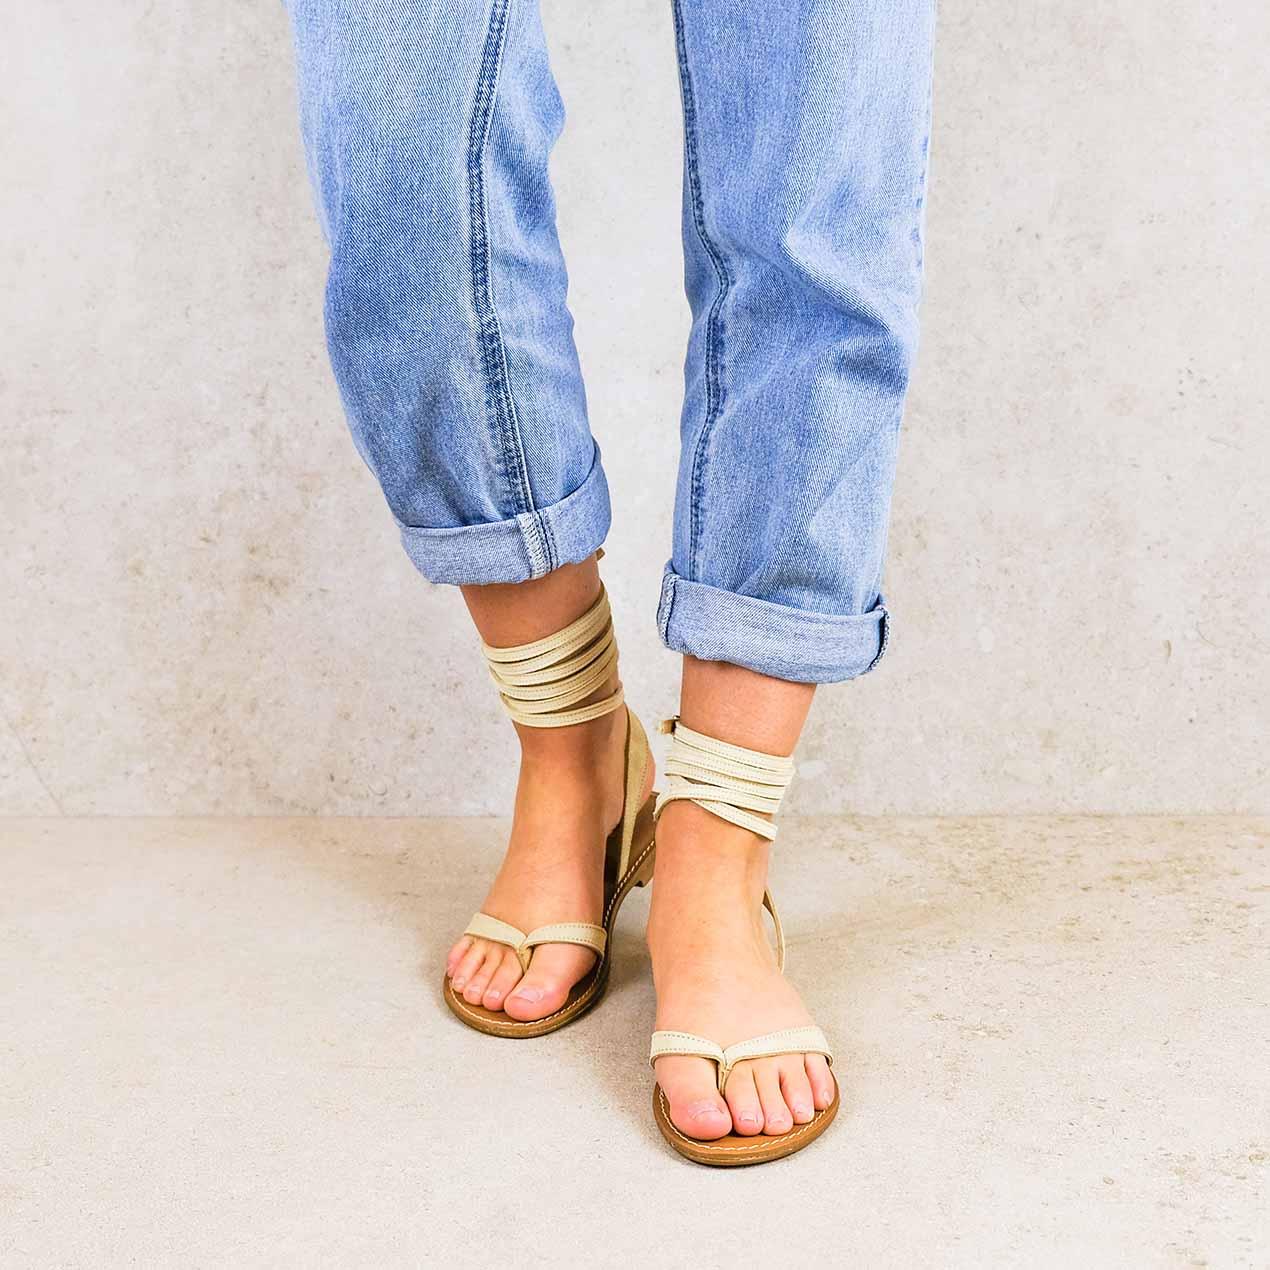 Sierra-ivory_lintsandalen sandals travelsandals vegan sustainable sandals wikkelsandalen